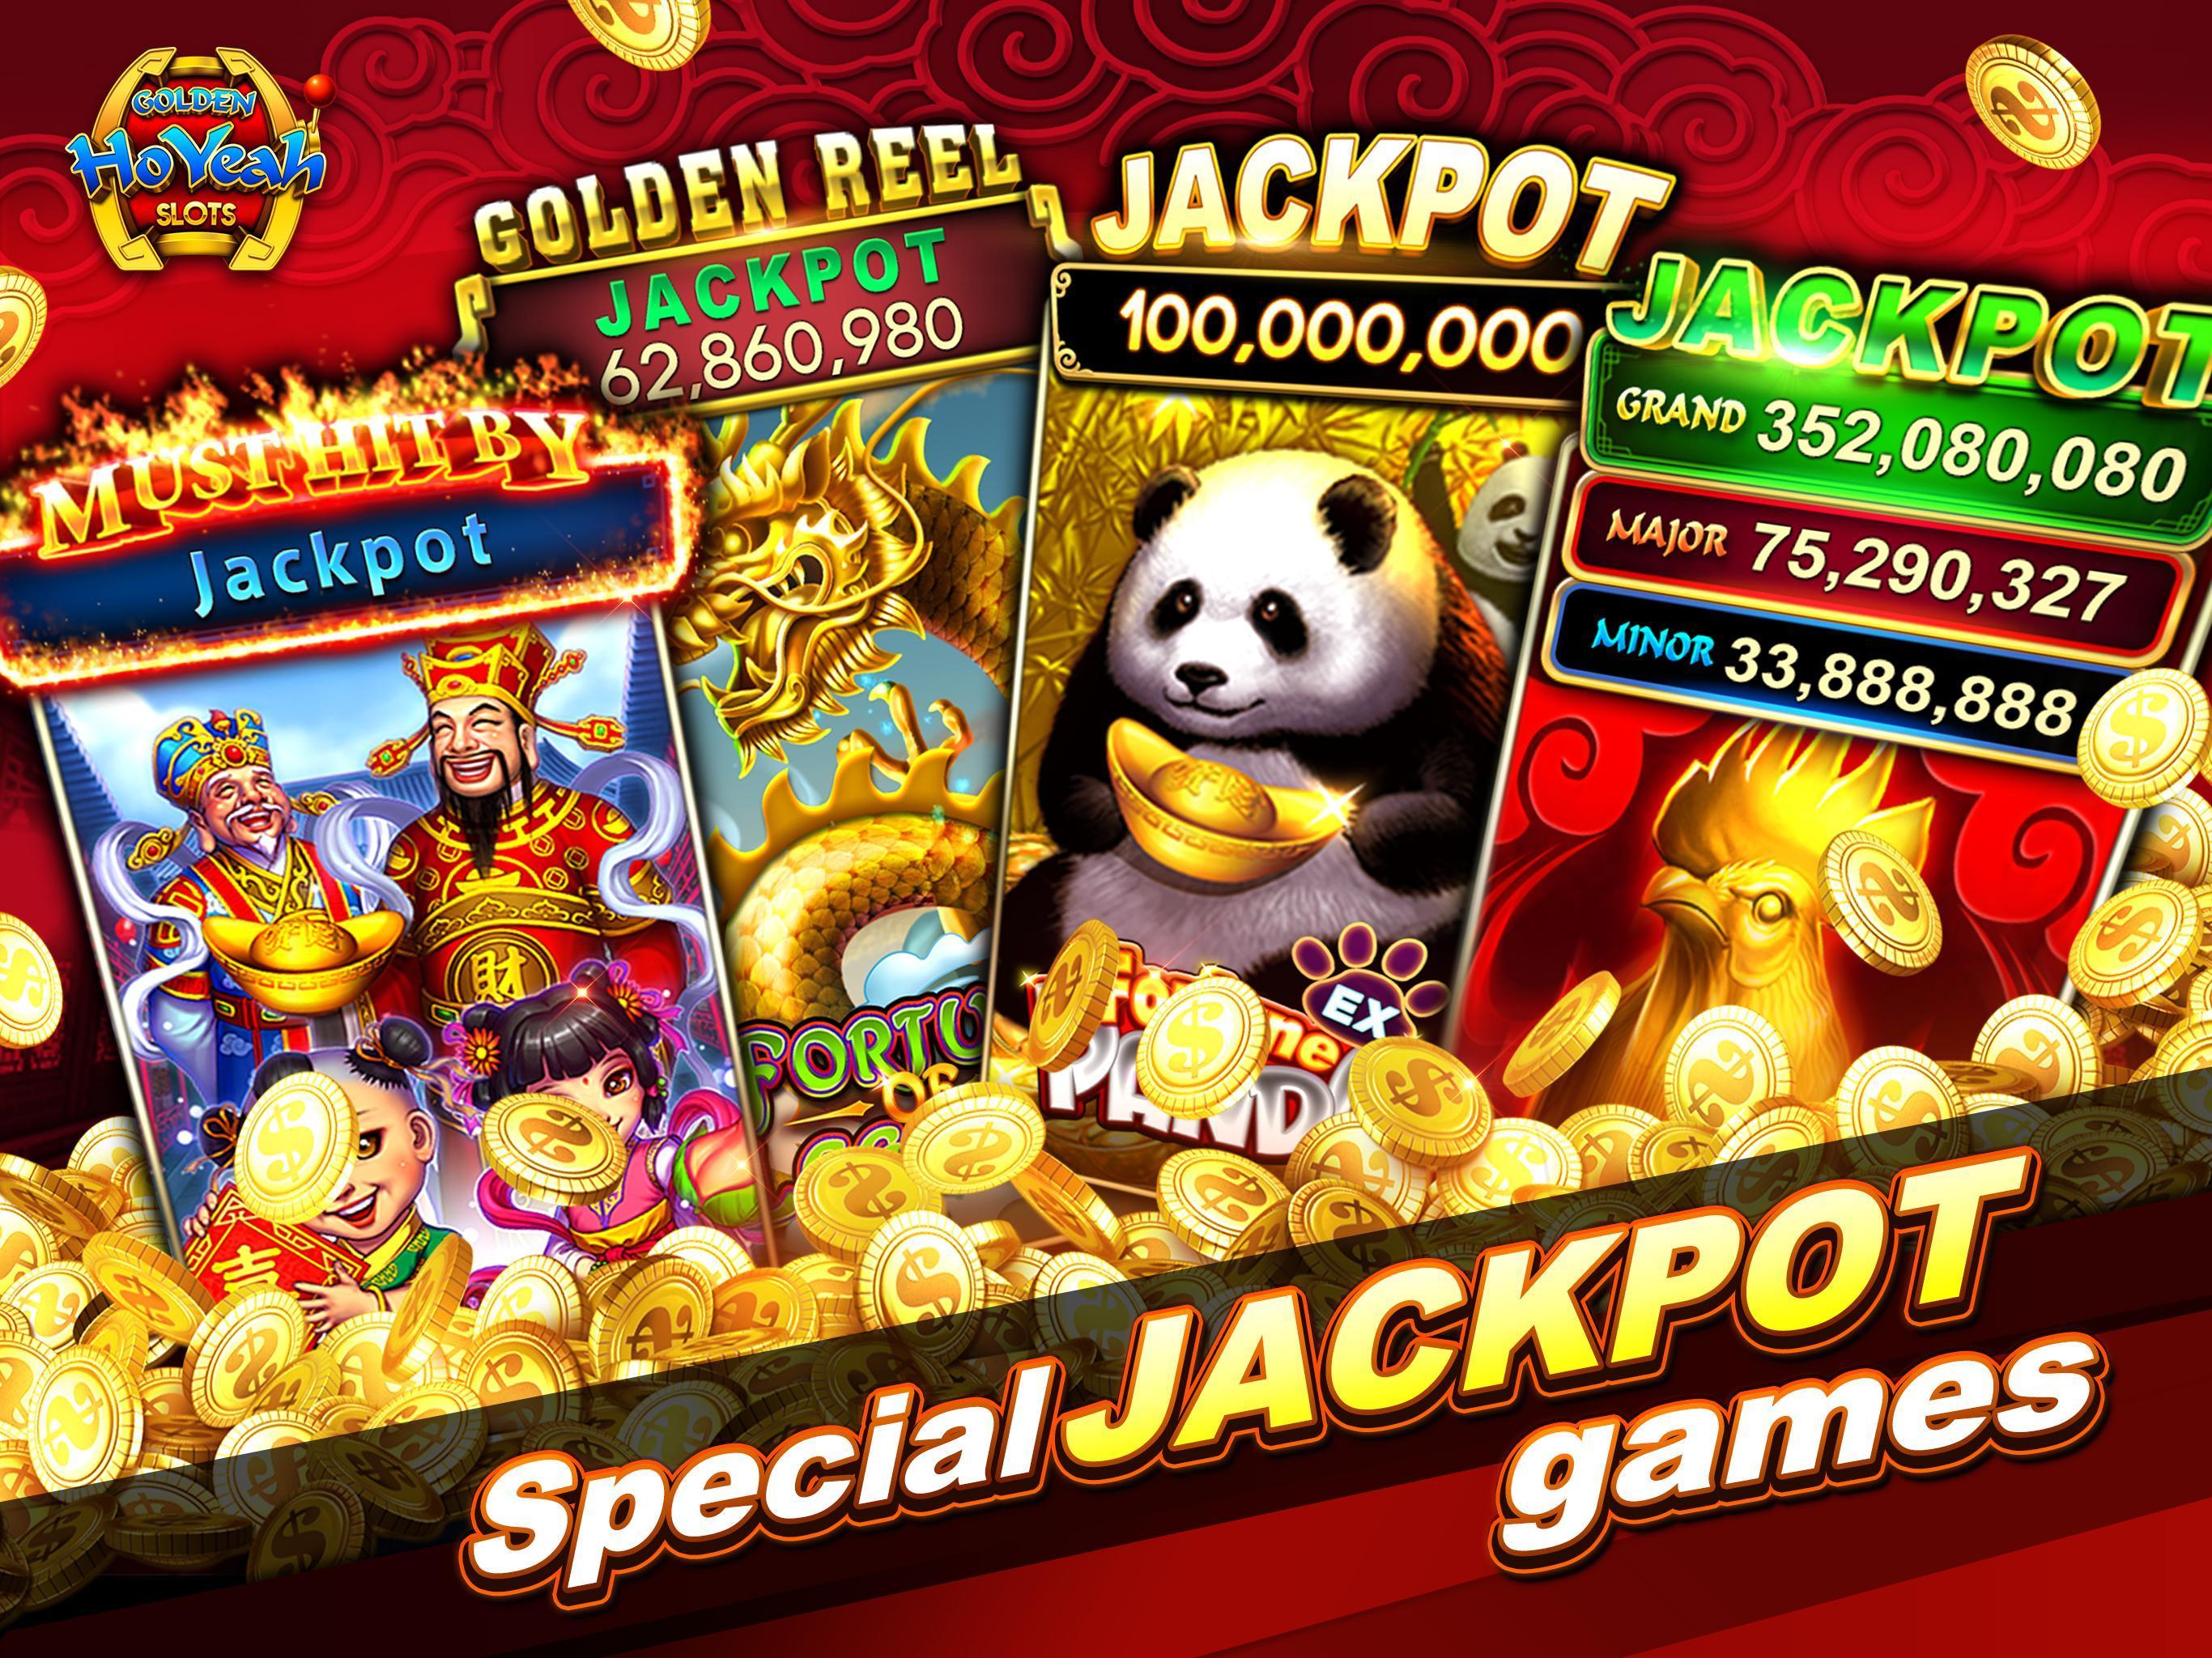 Slots (Golden HoYeah) - Casino Slots 2.5.7 Screenshot 19